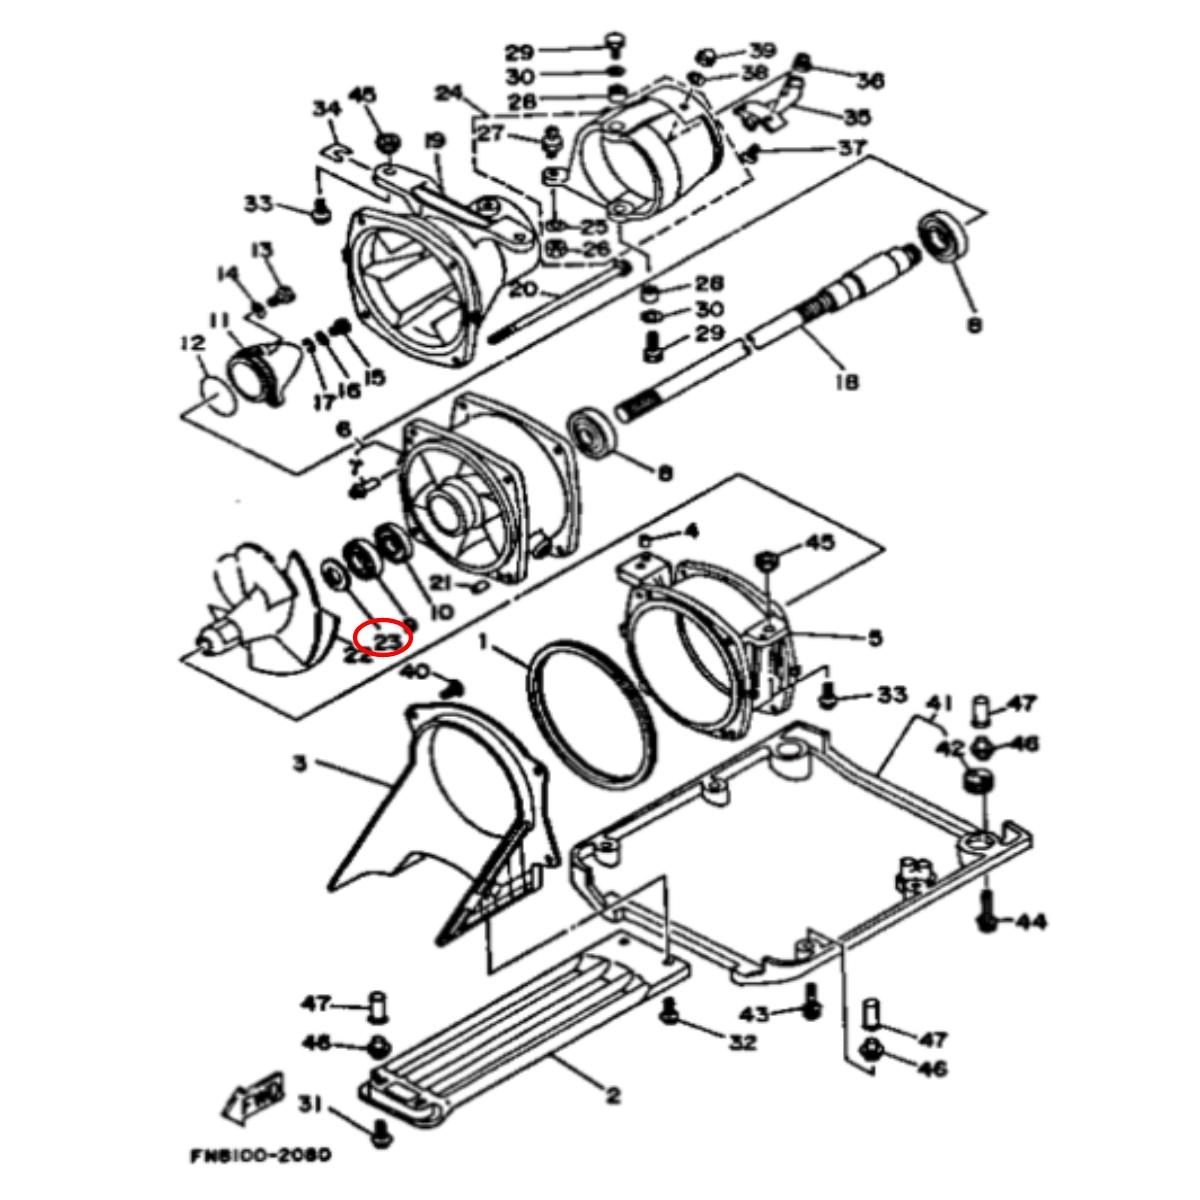 Retentor Turbina para Jet Ski Yamaha Nacional Traseiro  - Radical Peças - Peças para Jet Ski